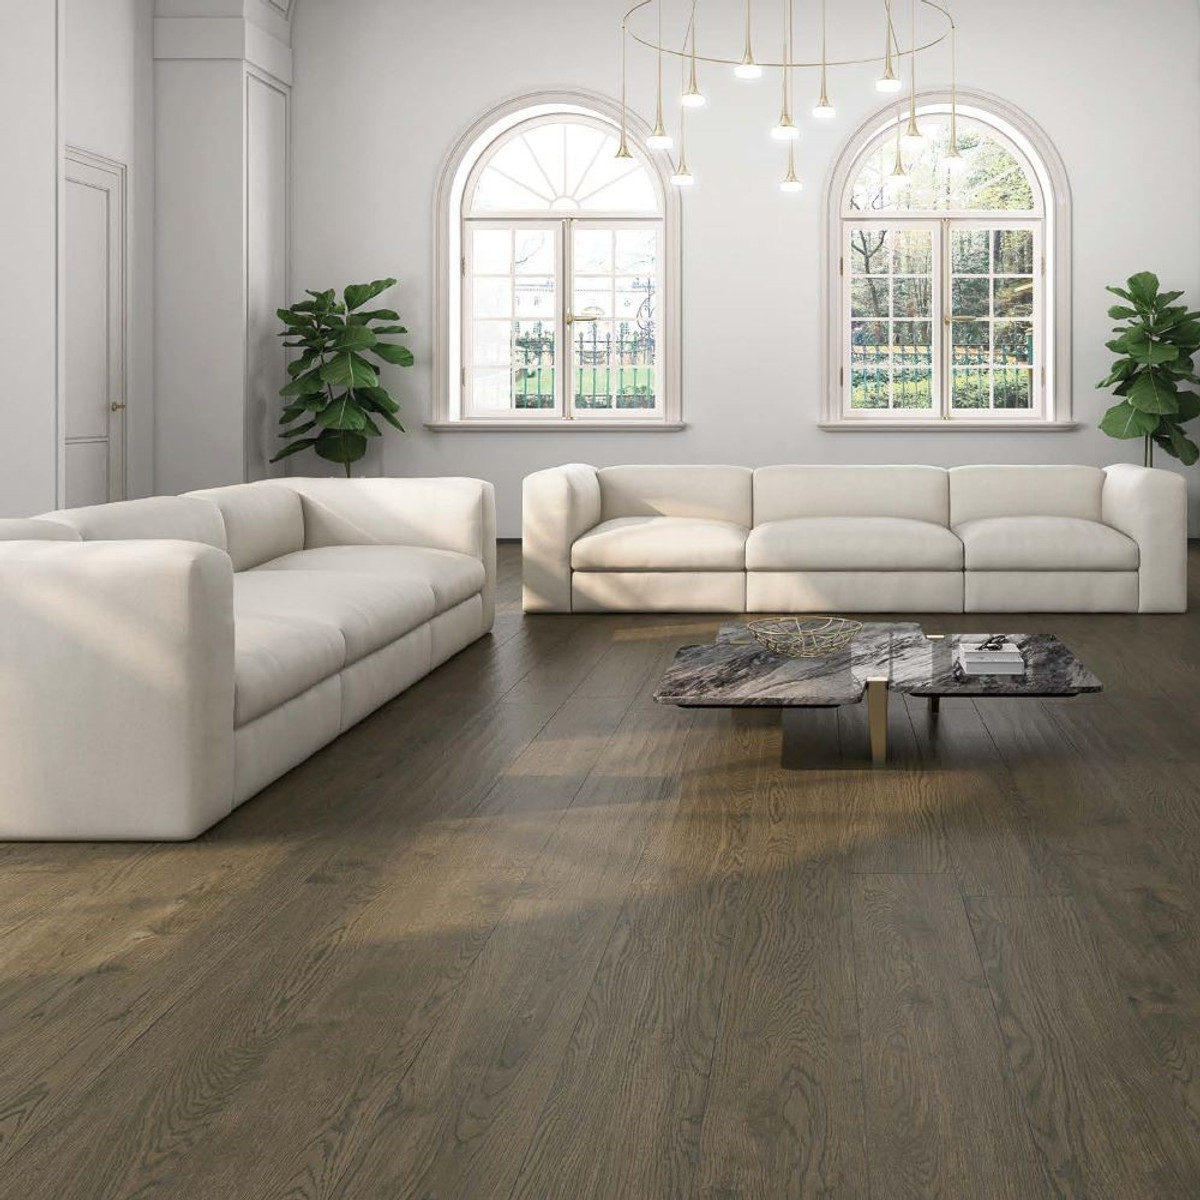 Tuscany Ka Noc Porcelain Wood Tile 22,5x180  Exclusive Board Length